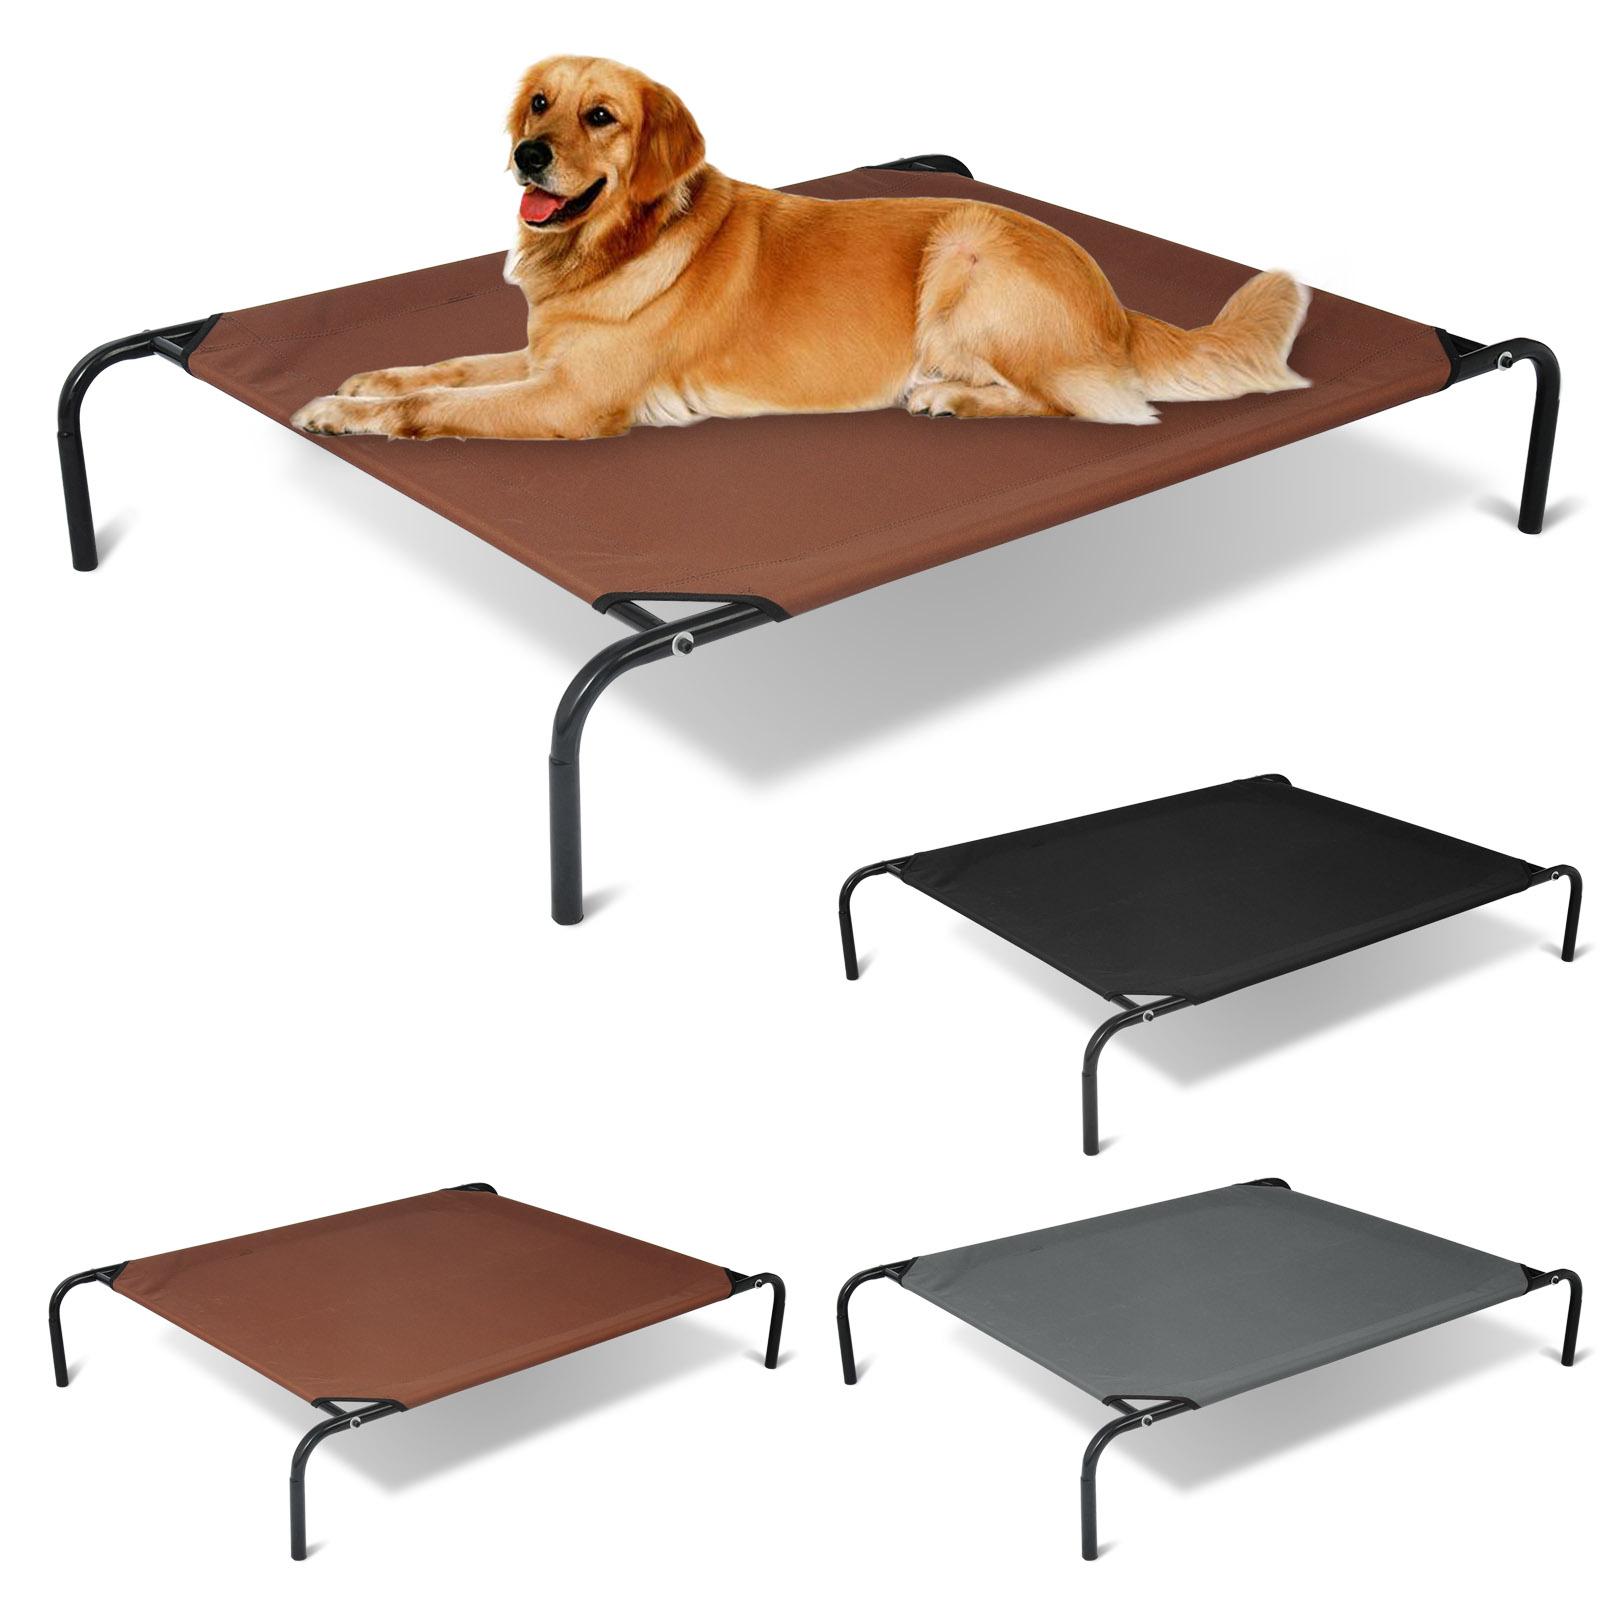 hundeliege hundebett schlafplatz hundesofa katzenbett haustierbett s l 635 ebay. Black Bedroom Furniture Sets. Home Design Ideas